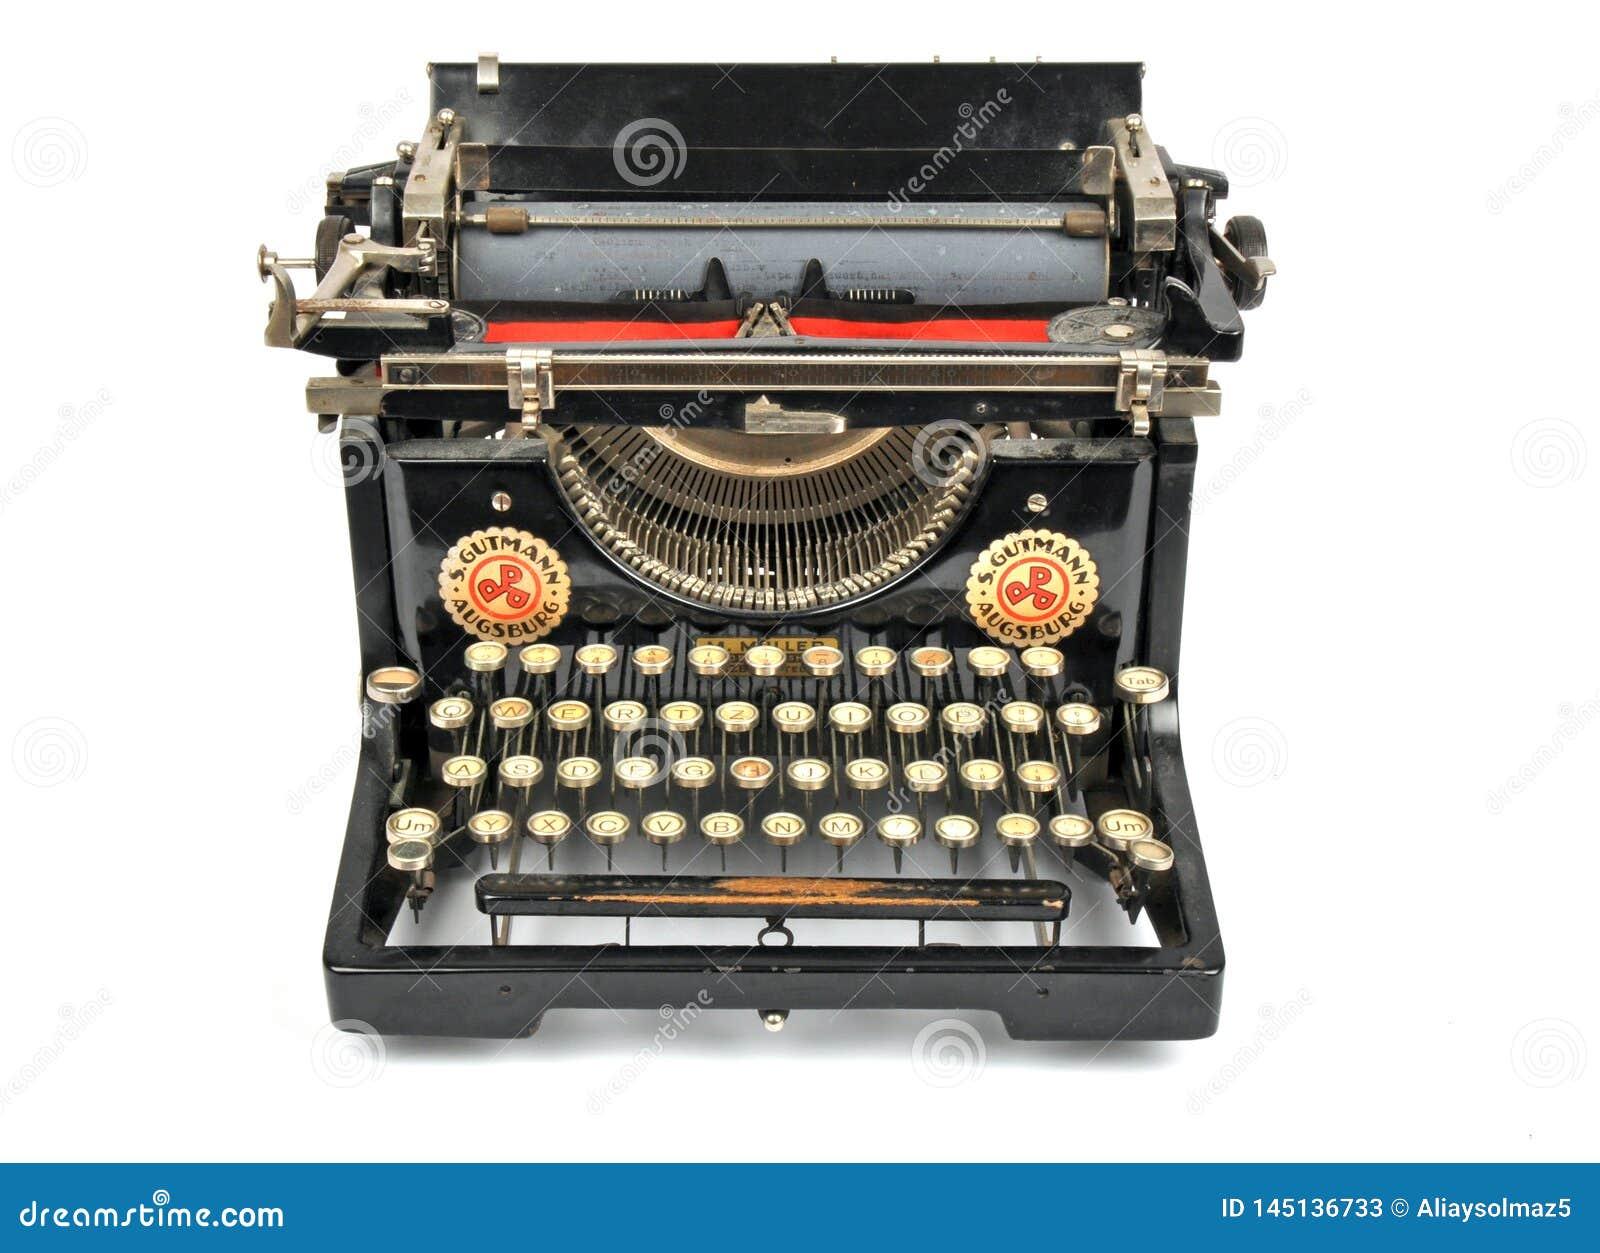 Antique Typewriter, Isolated Object, Isolated Antique Typewriter